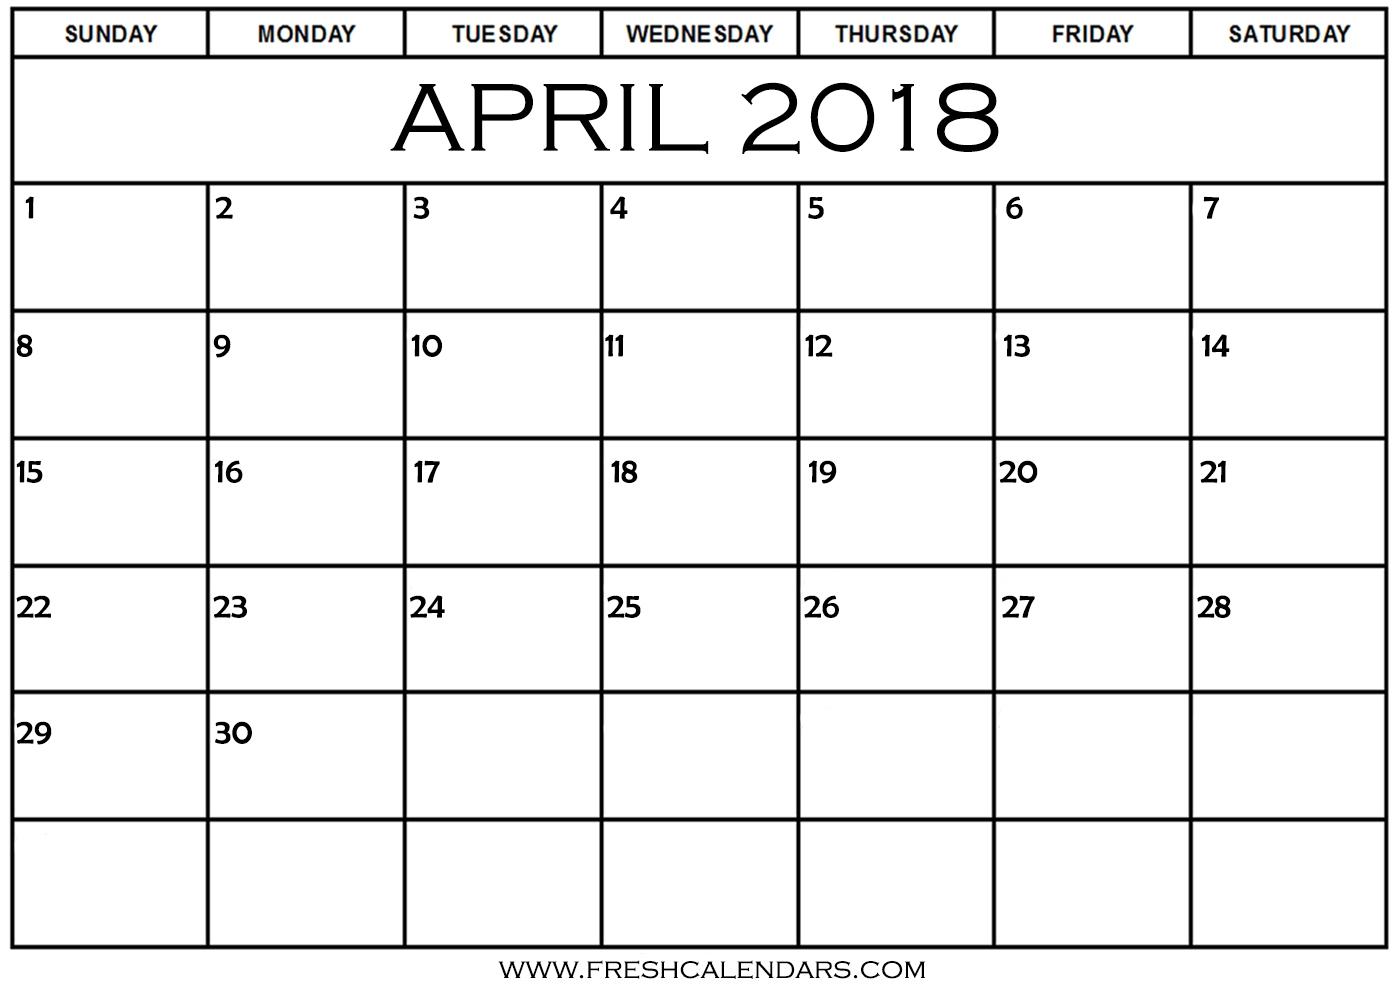 Free Printable Template April 2018 Calendar Bold Style  Xjb